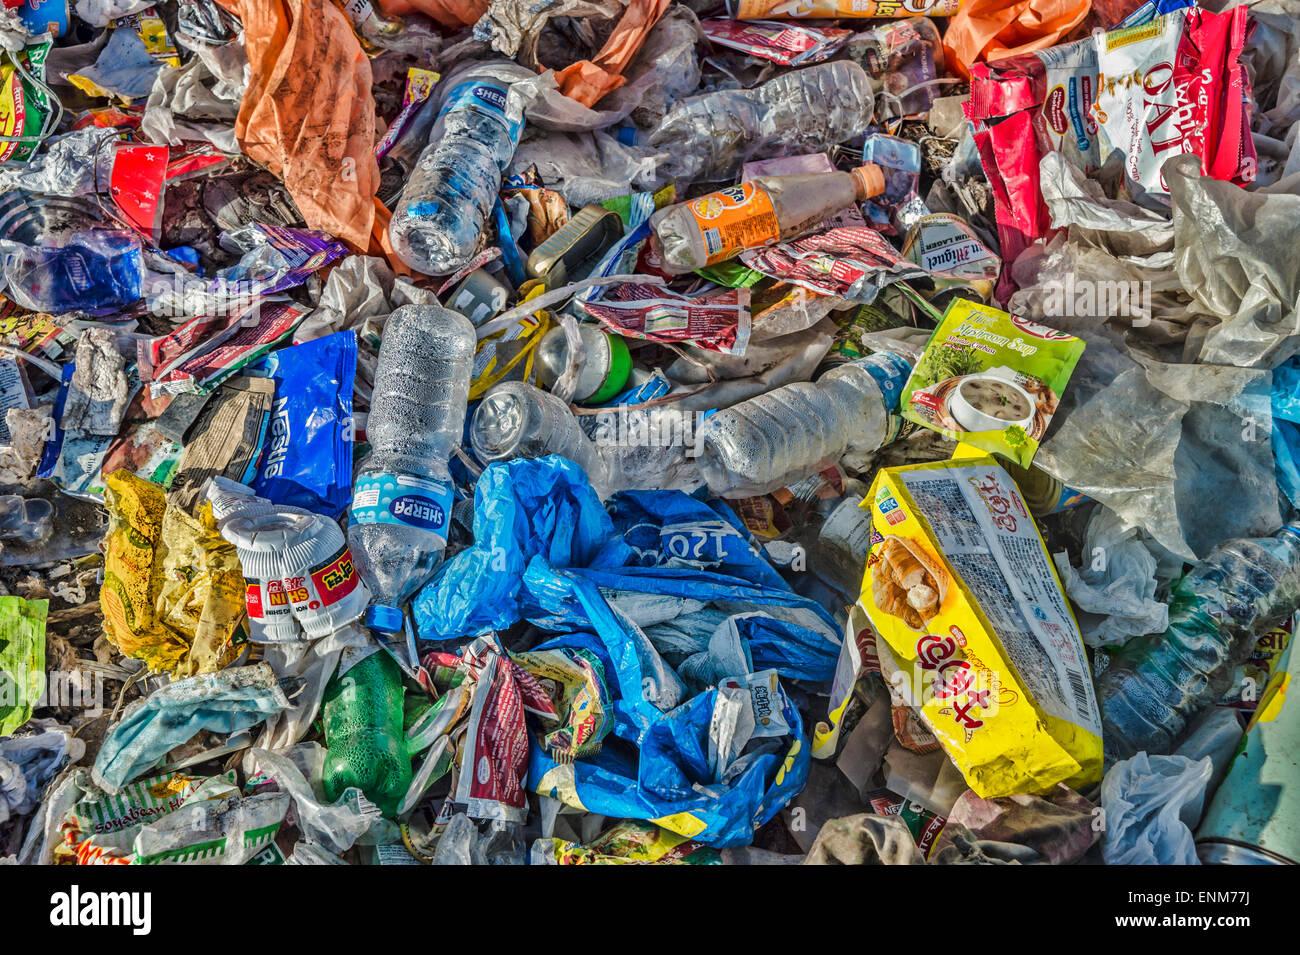 Garbage Dump in the Himalayas, Nepal - Stock Image